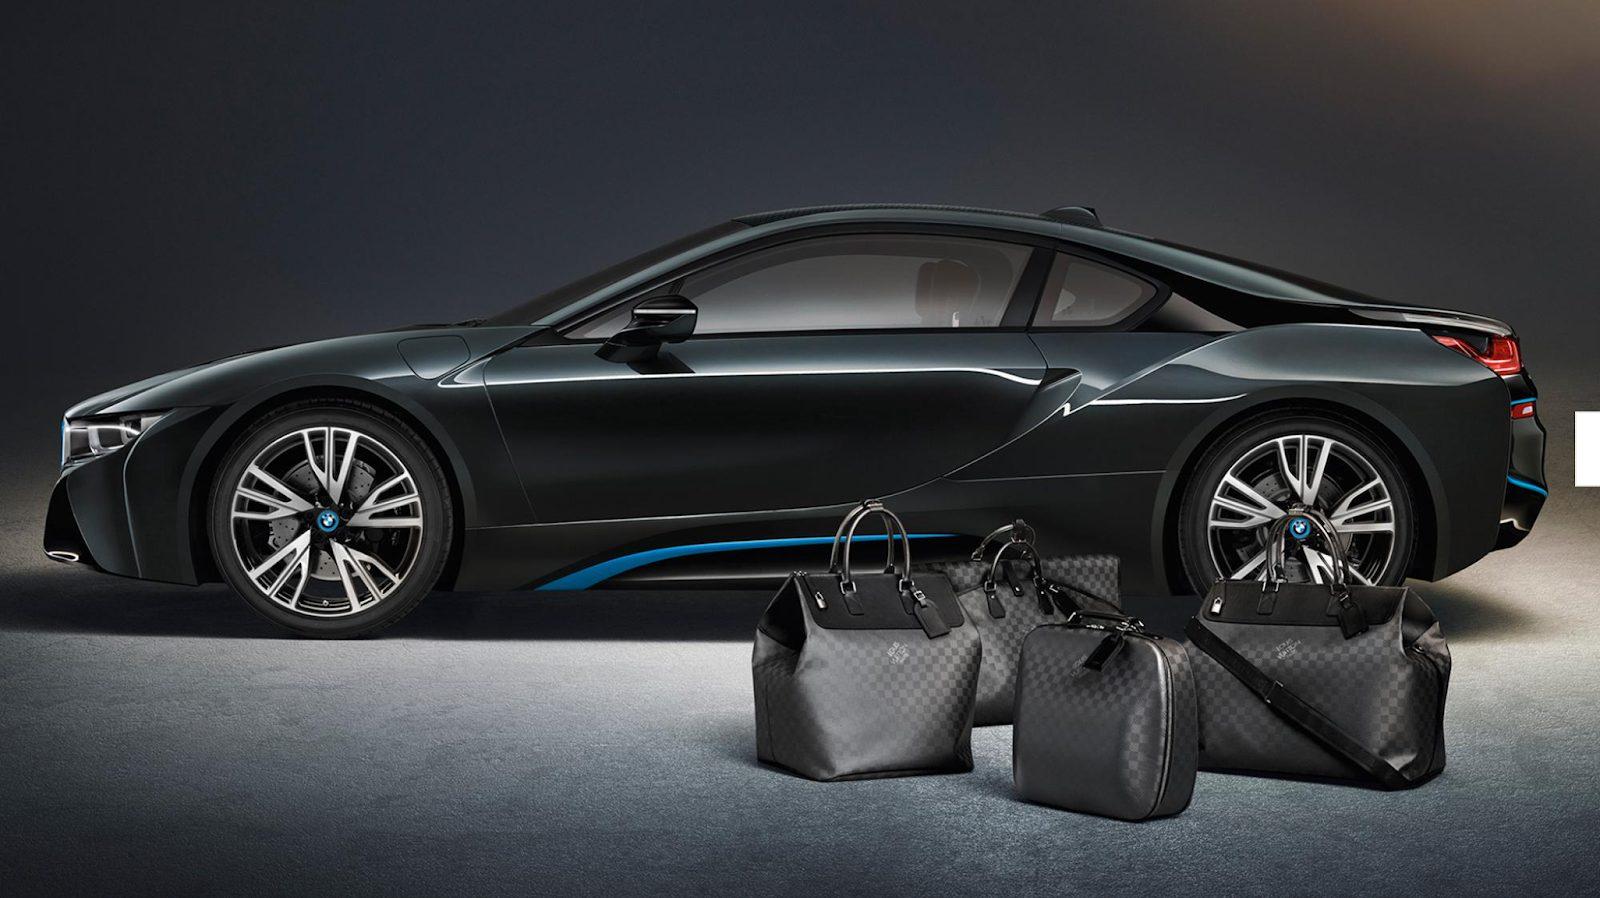 bmw x Louis Vuitton cobranding